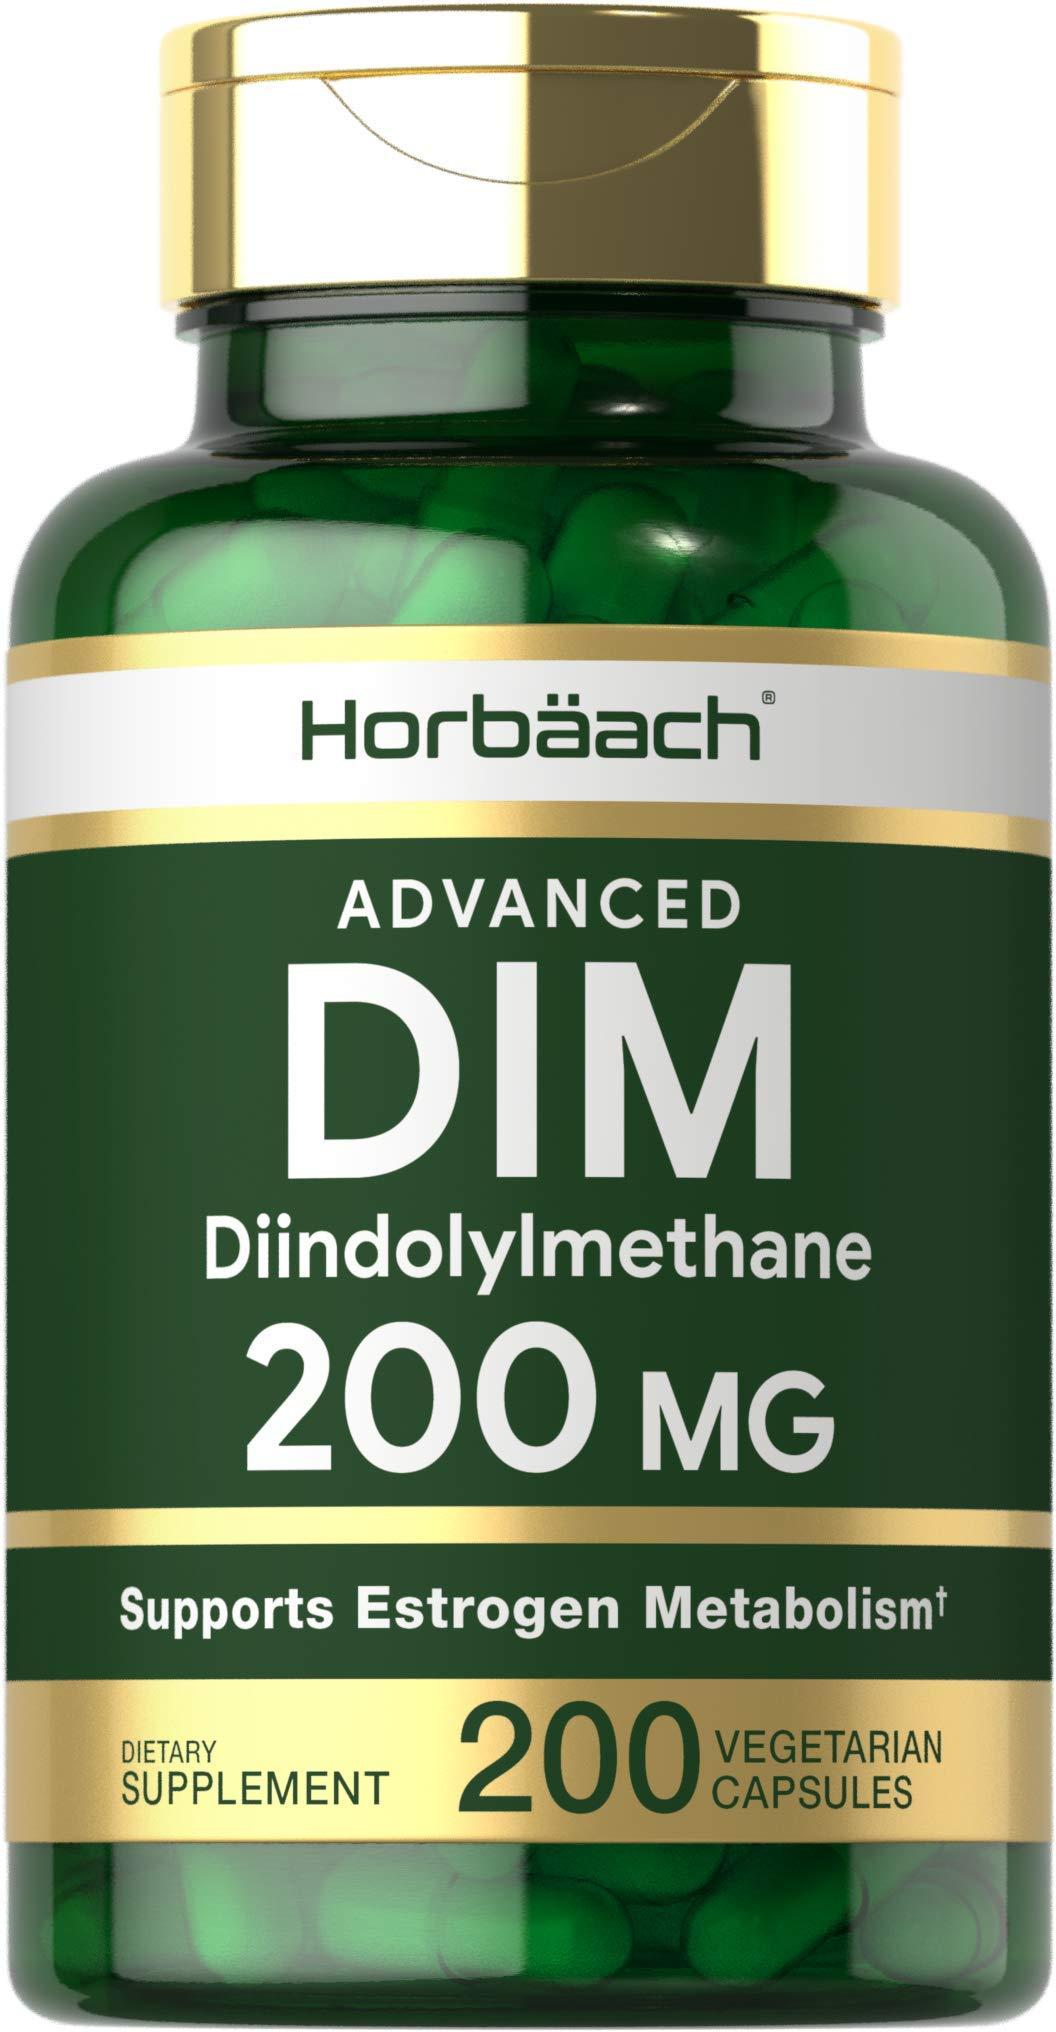 DIM Supplement 200mg   Advanced Diindolylmethane   200 Veggie Capsules   Vegetarian, Non-GMO, Gluten Free   by Horbaach